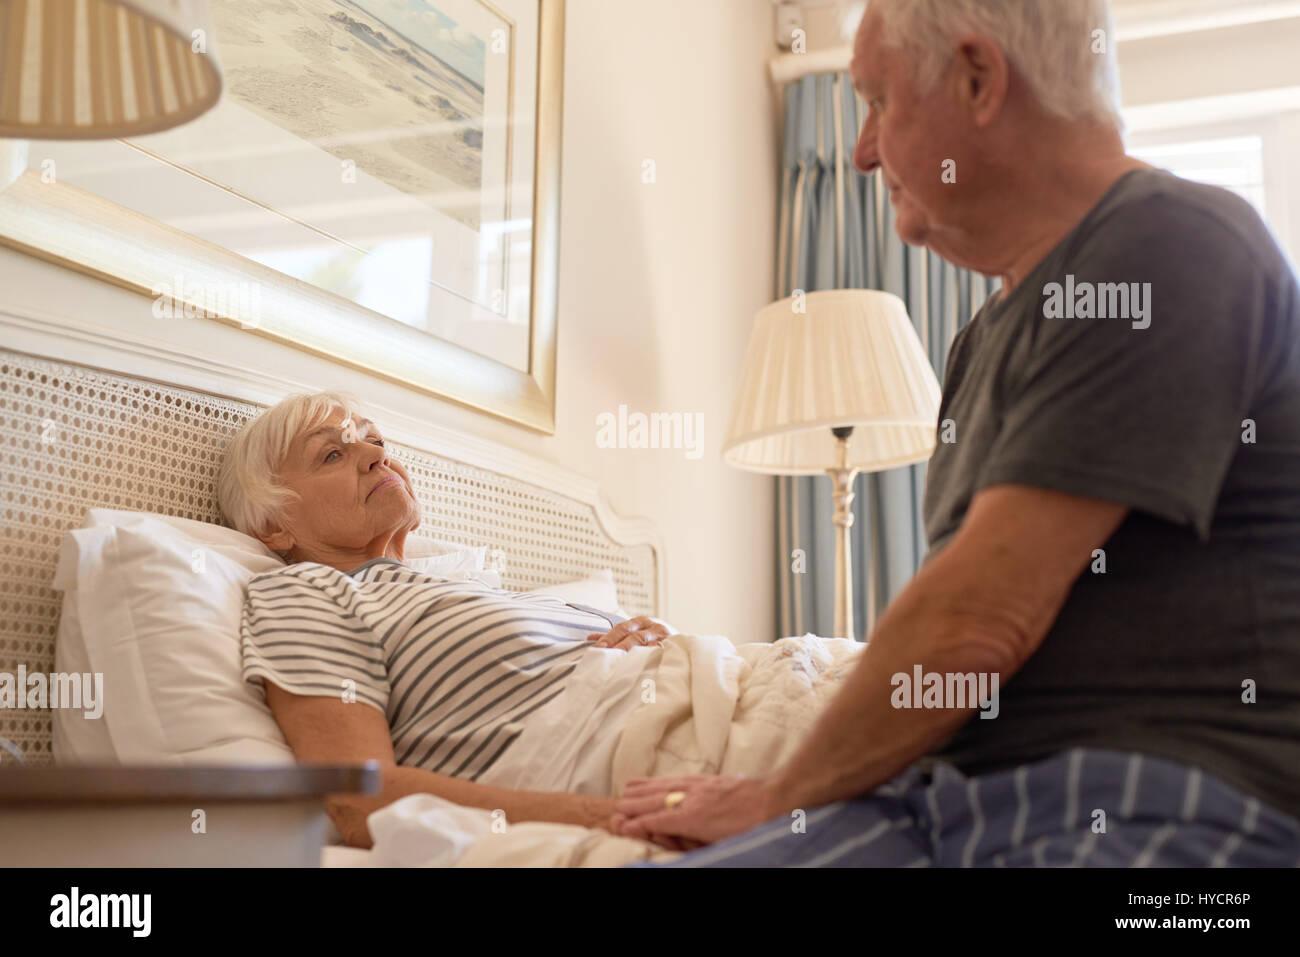 Loving Husband Caring Sick Wife Stock Photos & Loving